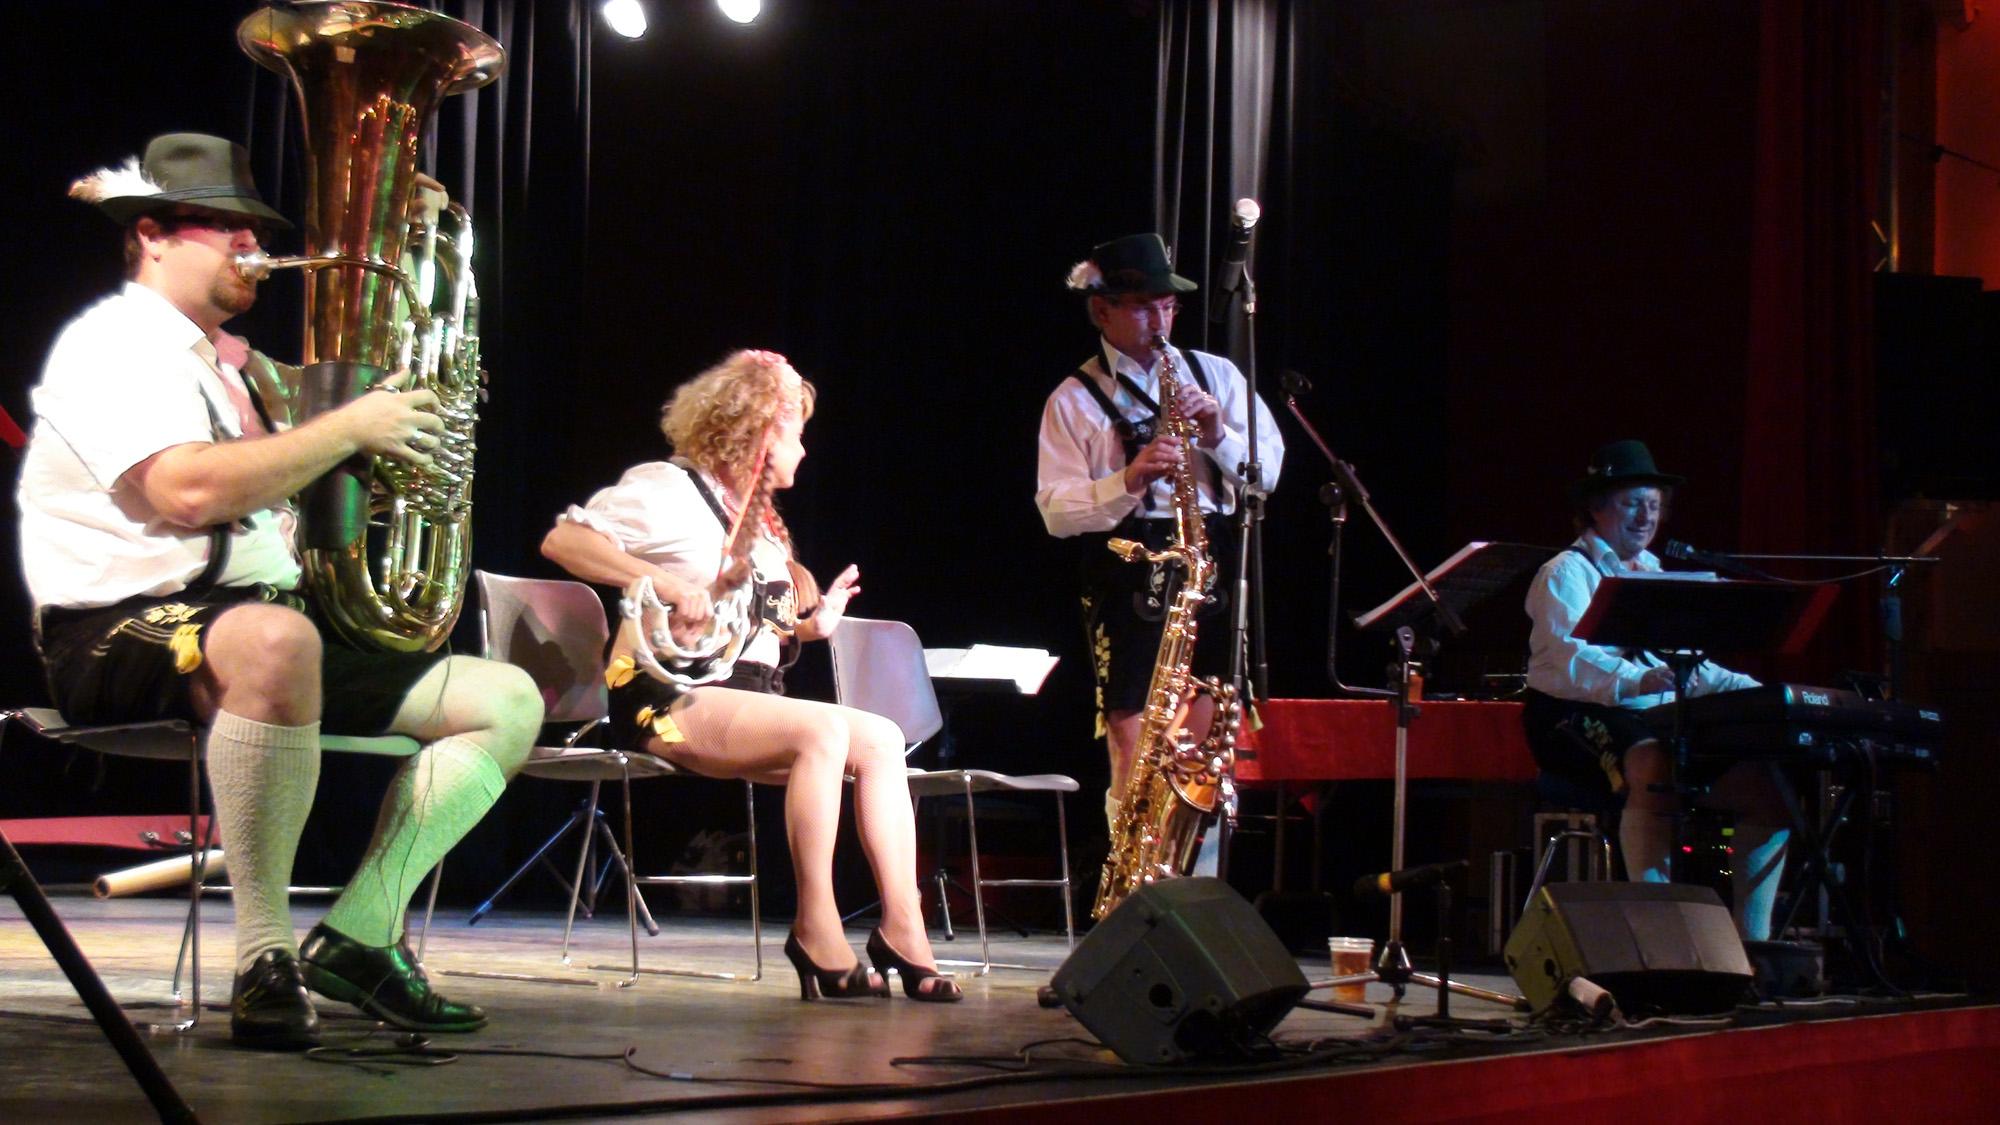 2a Ollainville 12 novembre 2011 orchestre bavarois